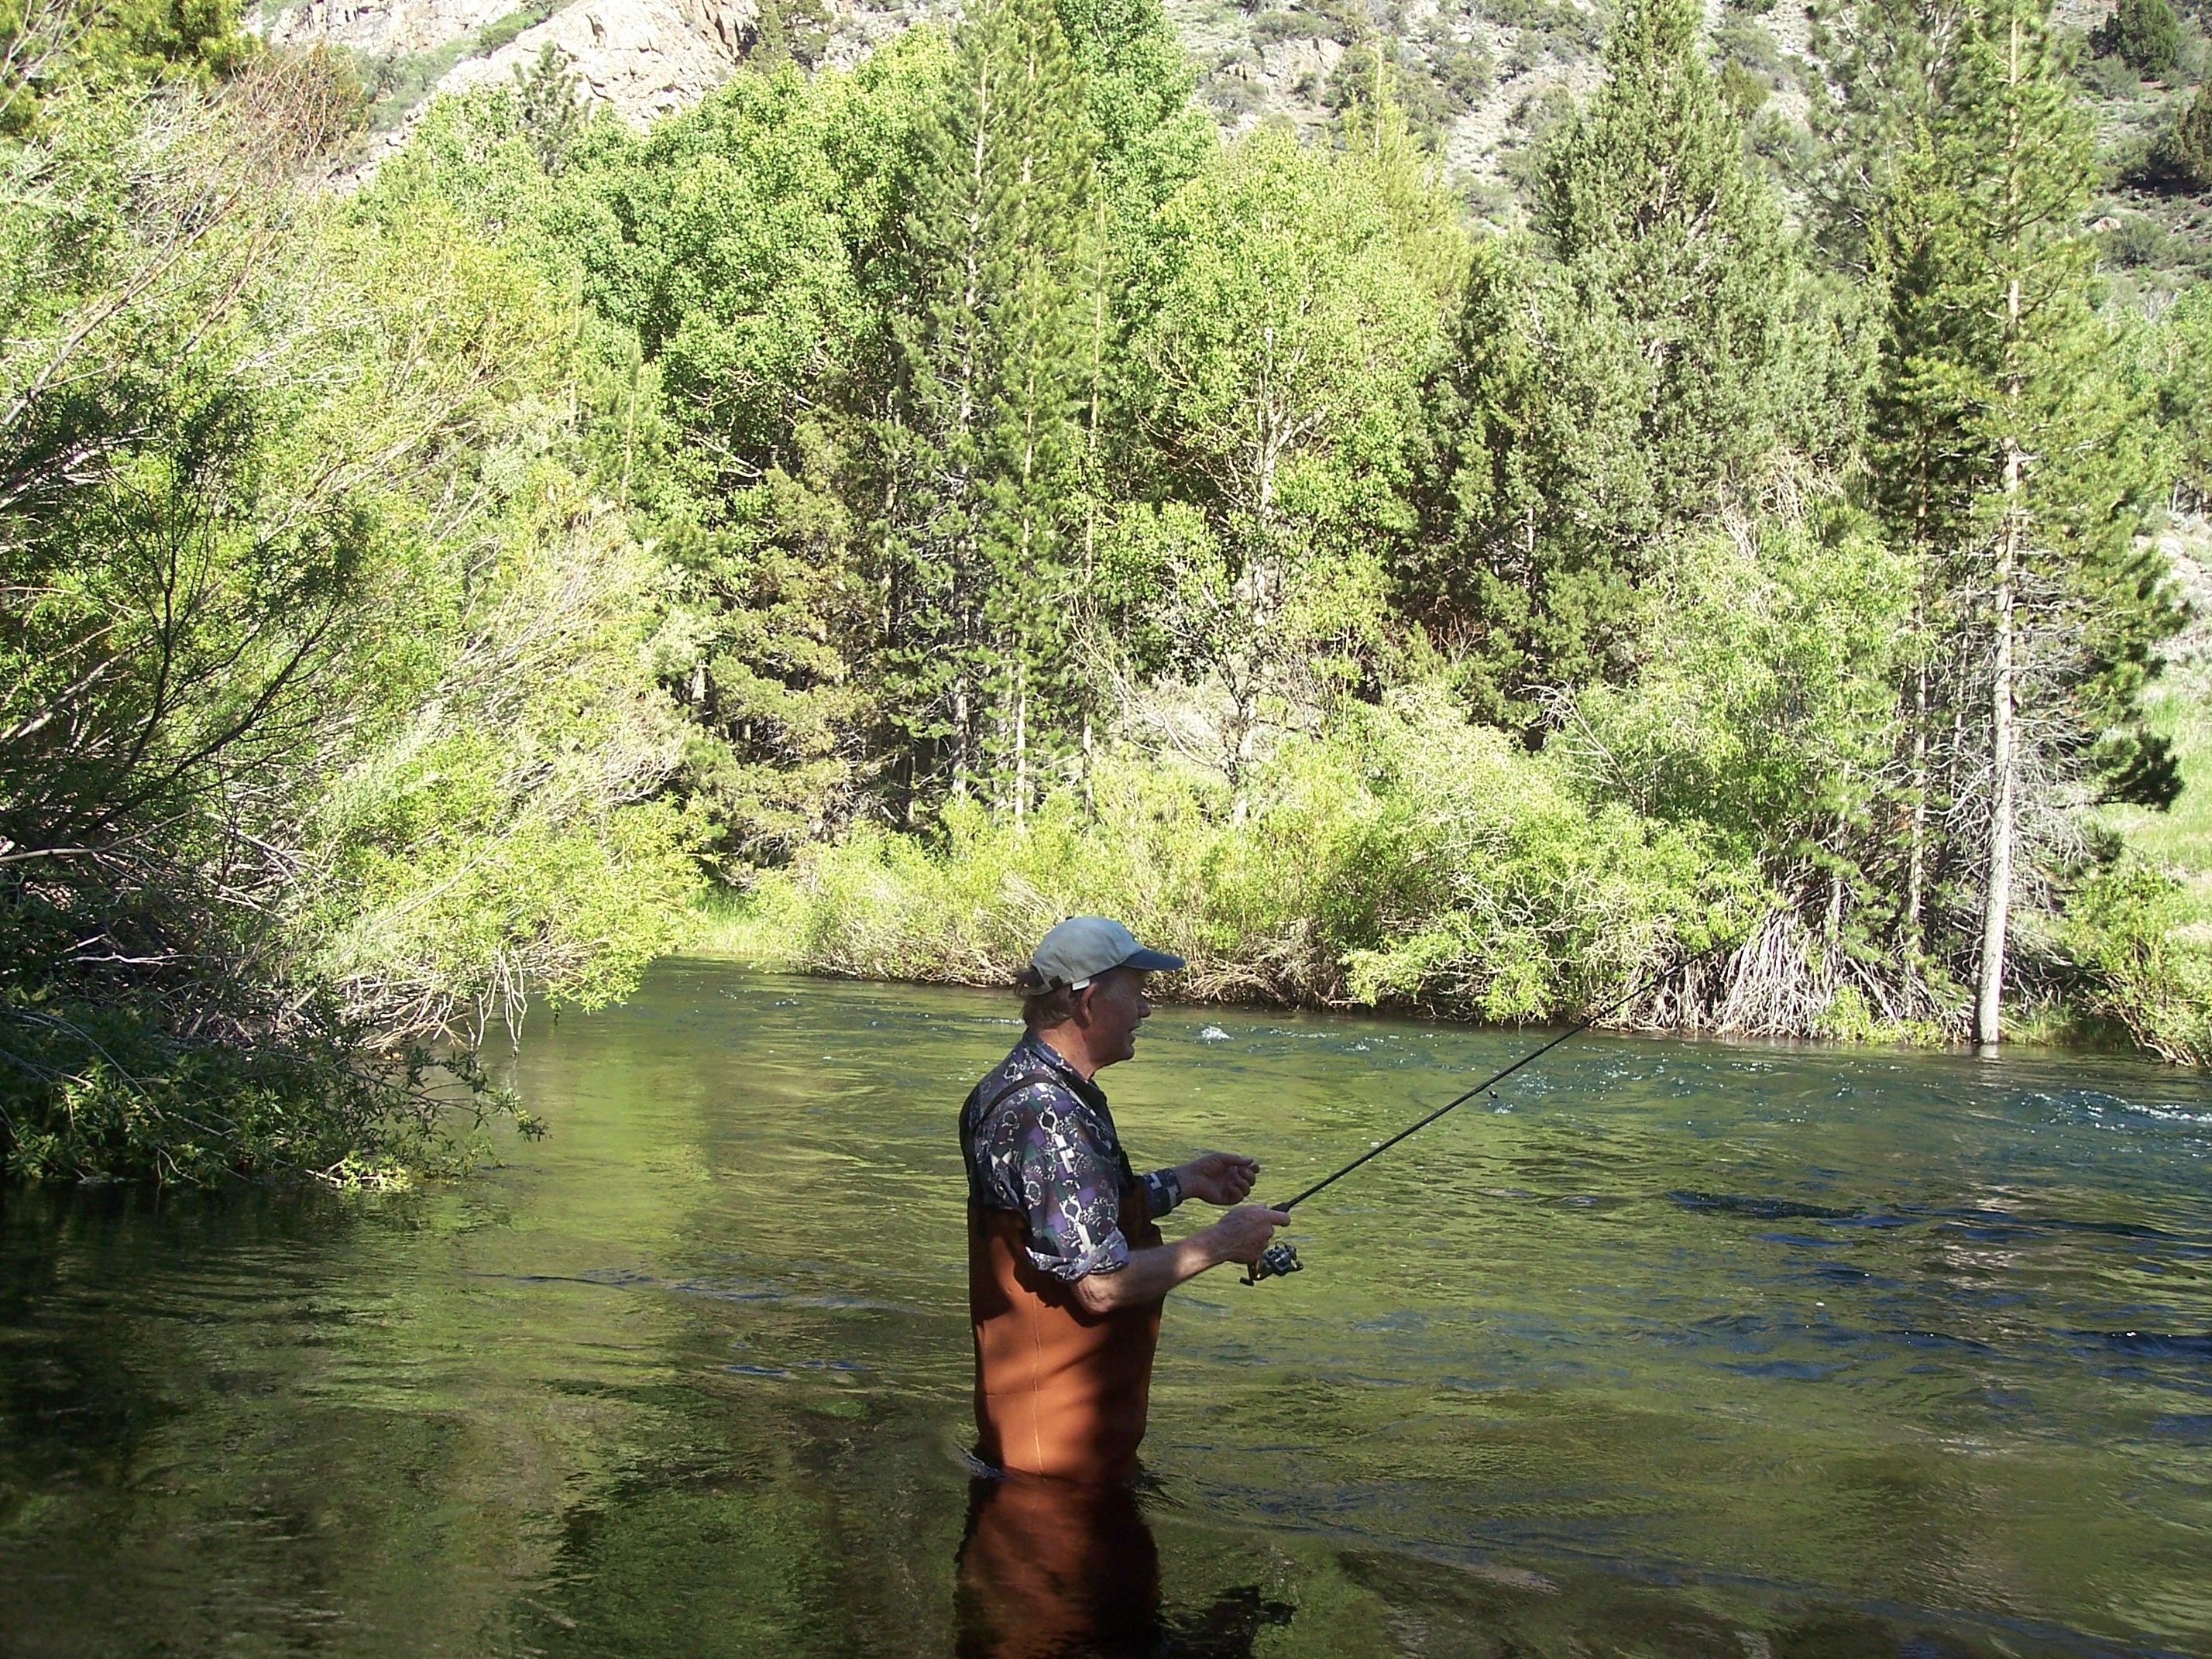 Rush creek near june lake california yes it 39 s me for Fishing lakes near me